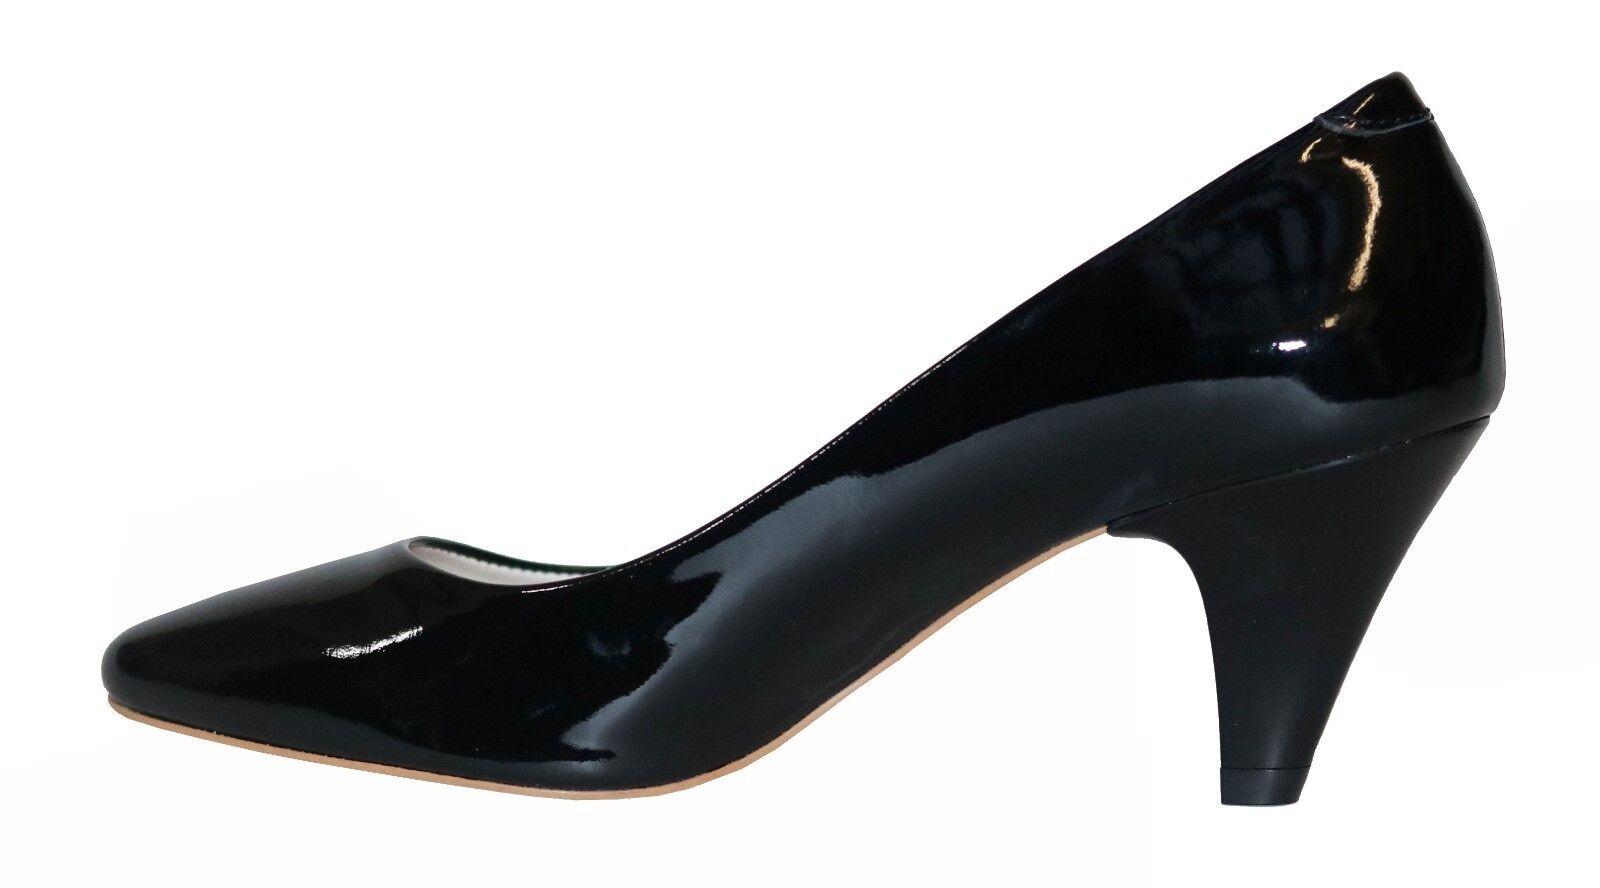 Damen Schuhe Pumps Elegant Gr.37 Schwarz